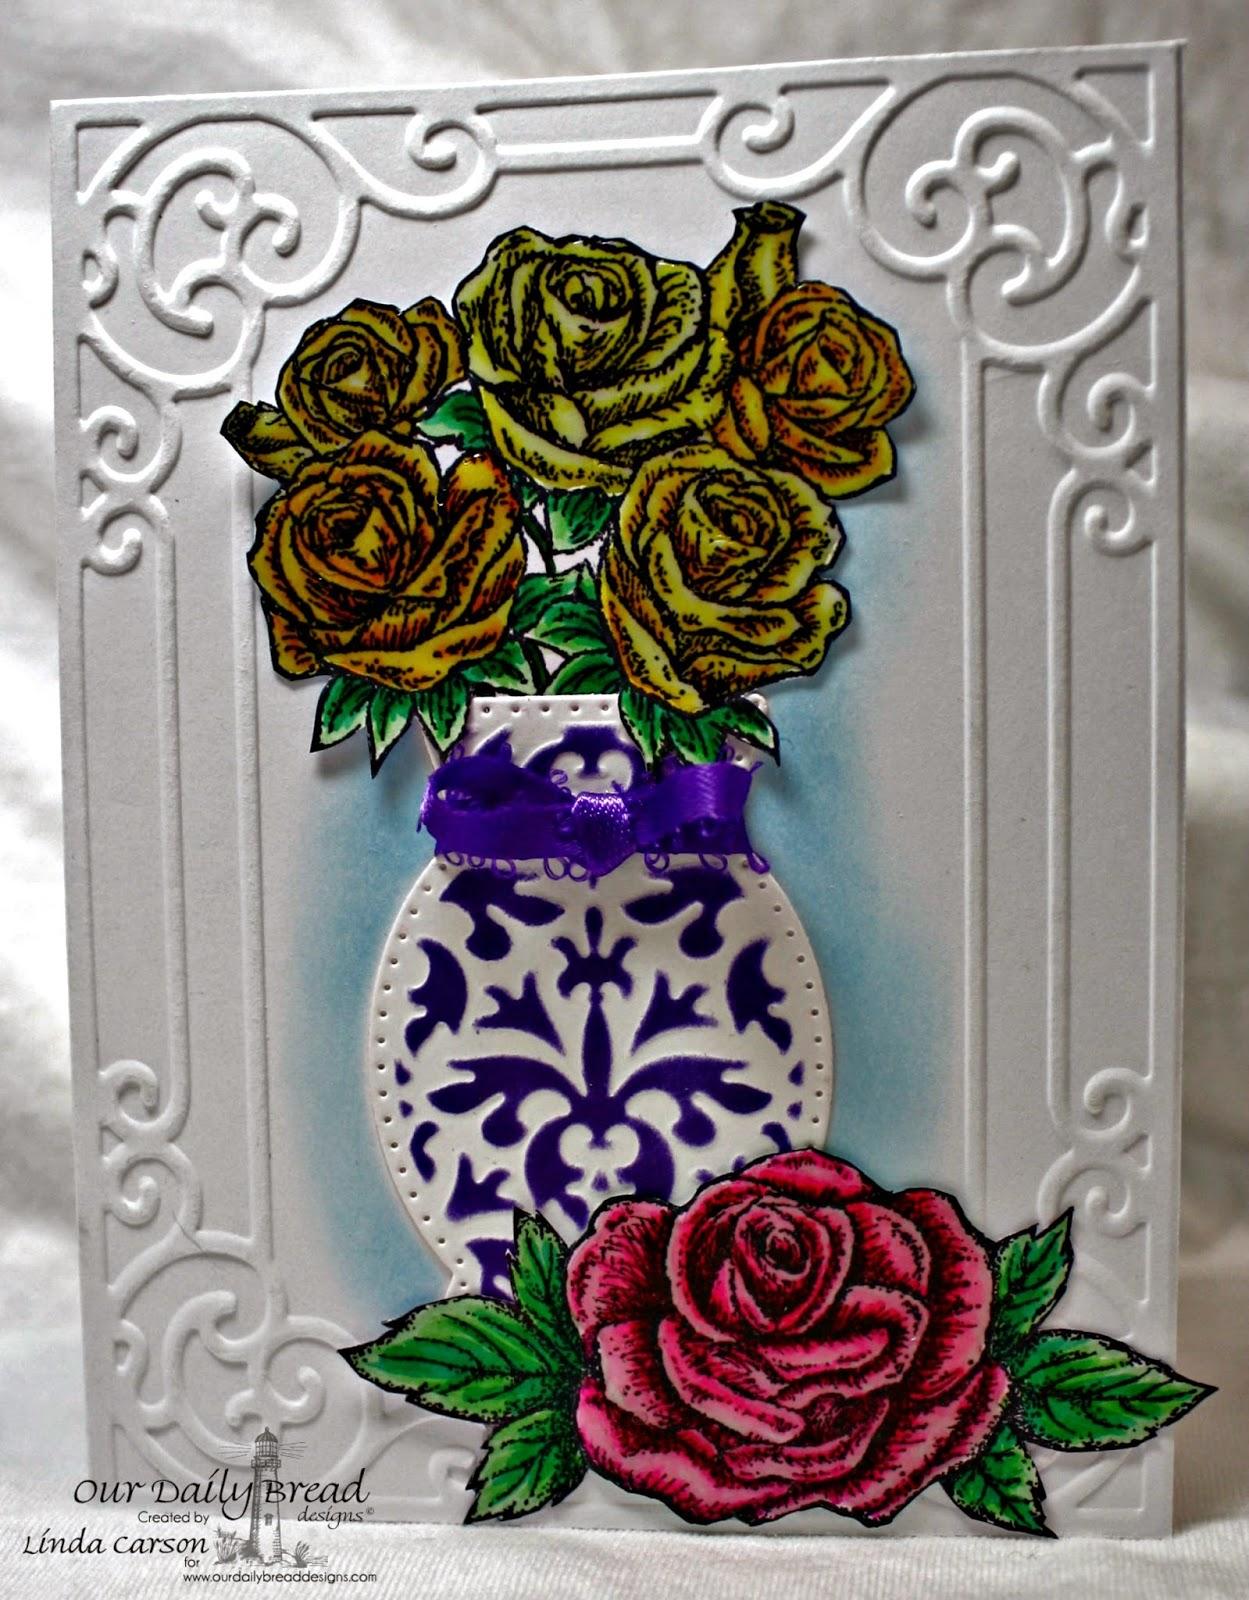 Properties:  ODBD, Rose Bouquet, My Friend, Decorative Vase die, designer Linda Carson